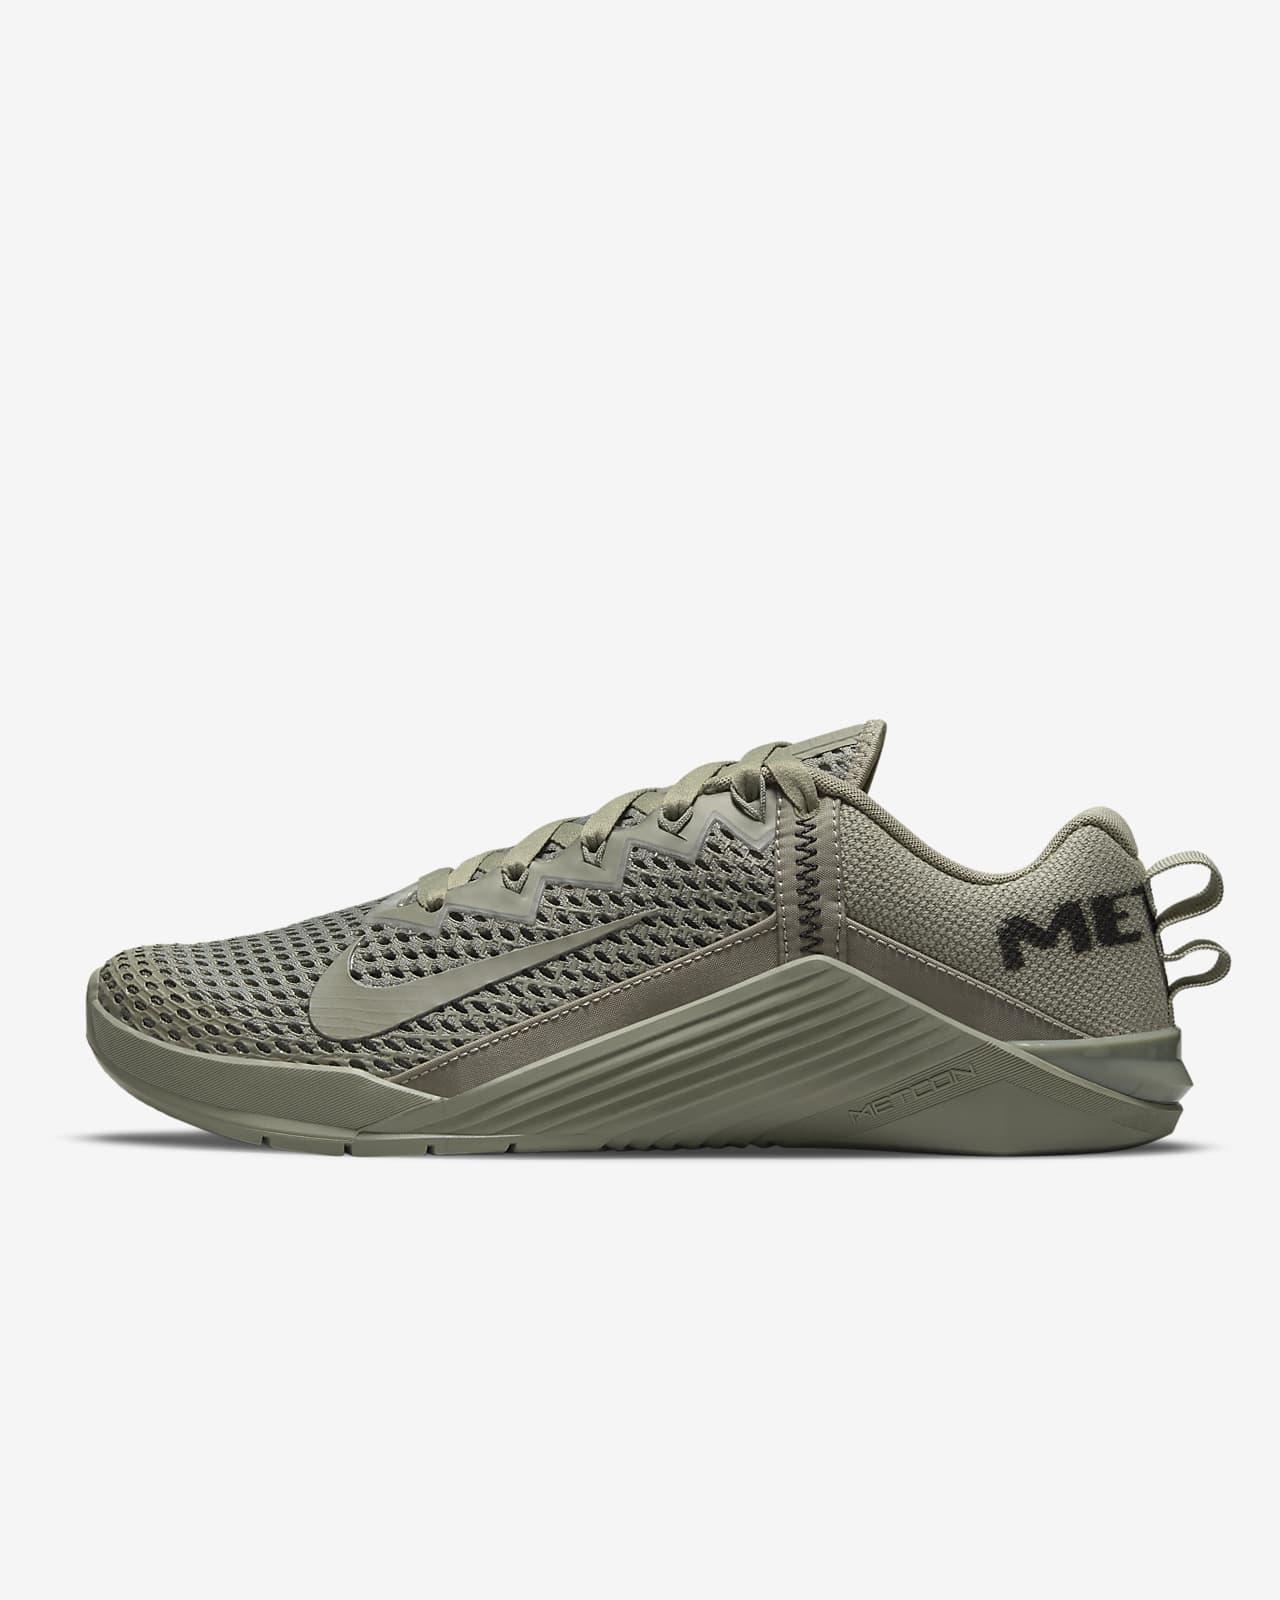 Buty treningowe Nike Metcon 6 AMP